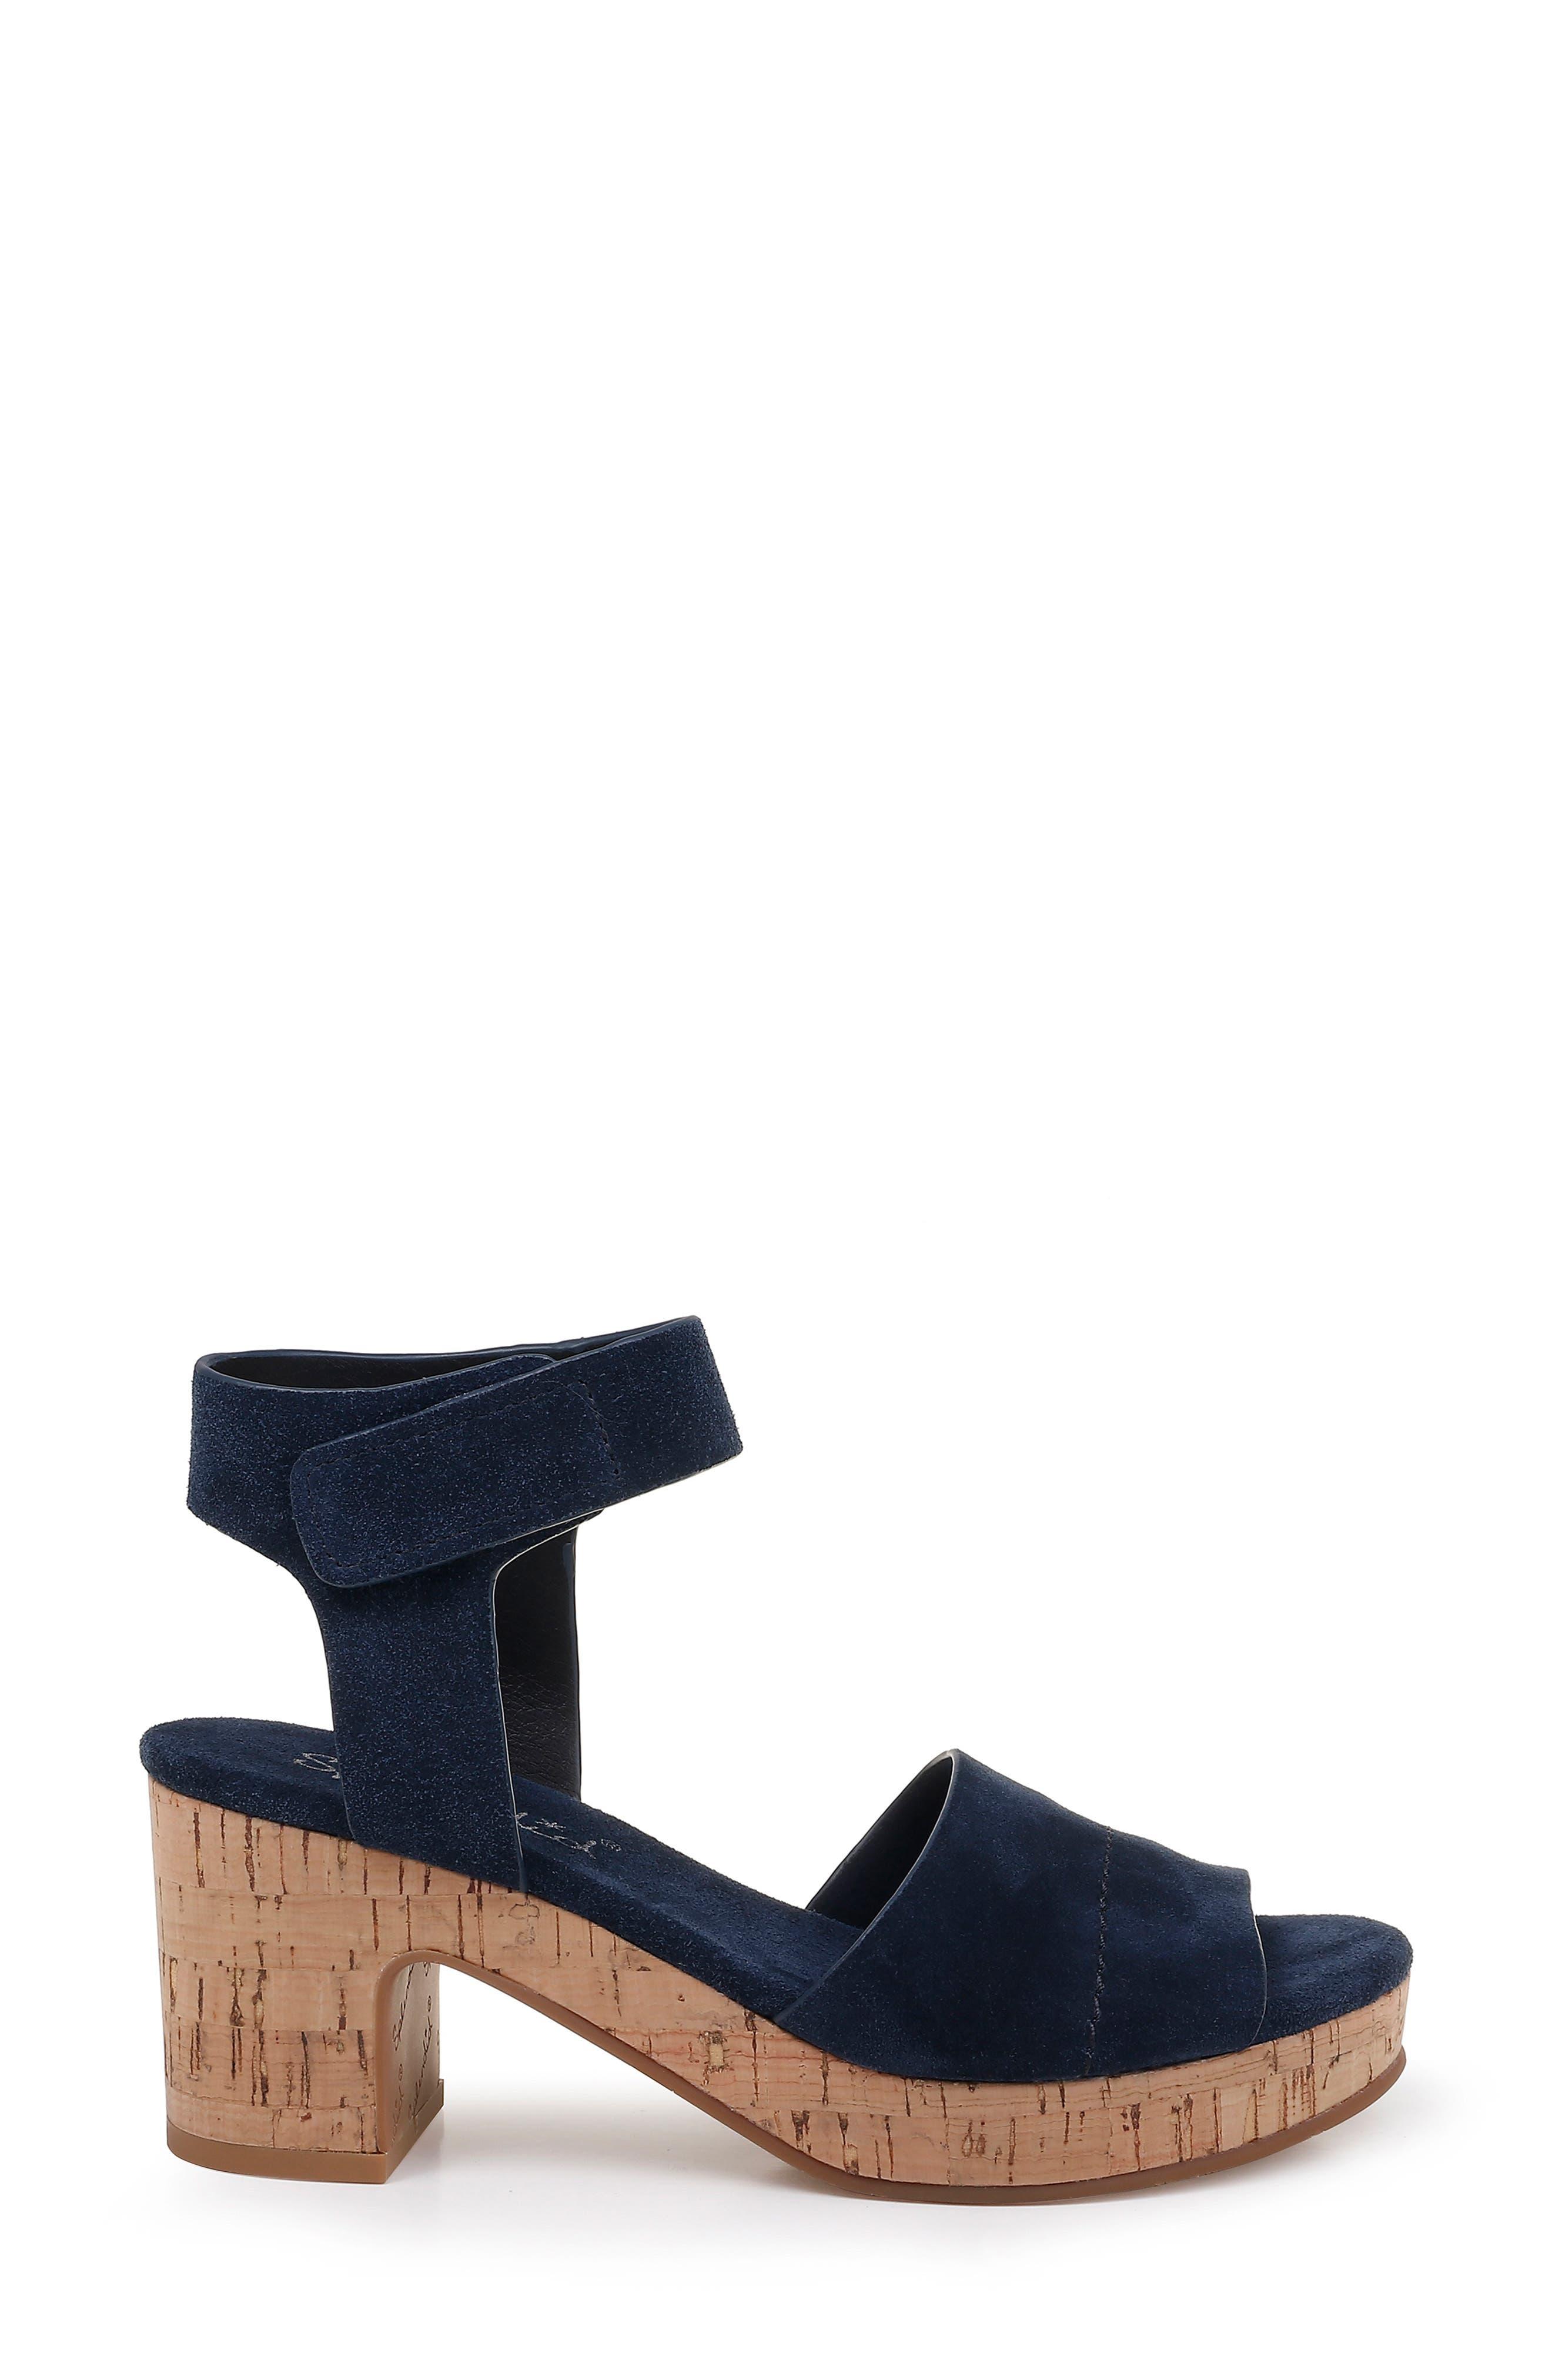 SPLENDID, Thatcher Platform Ankle Strap Sandal, Alternate thumbnail 3, color, NAVY SUEDE